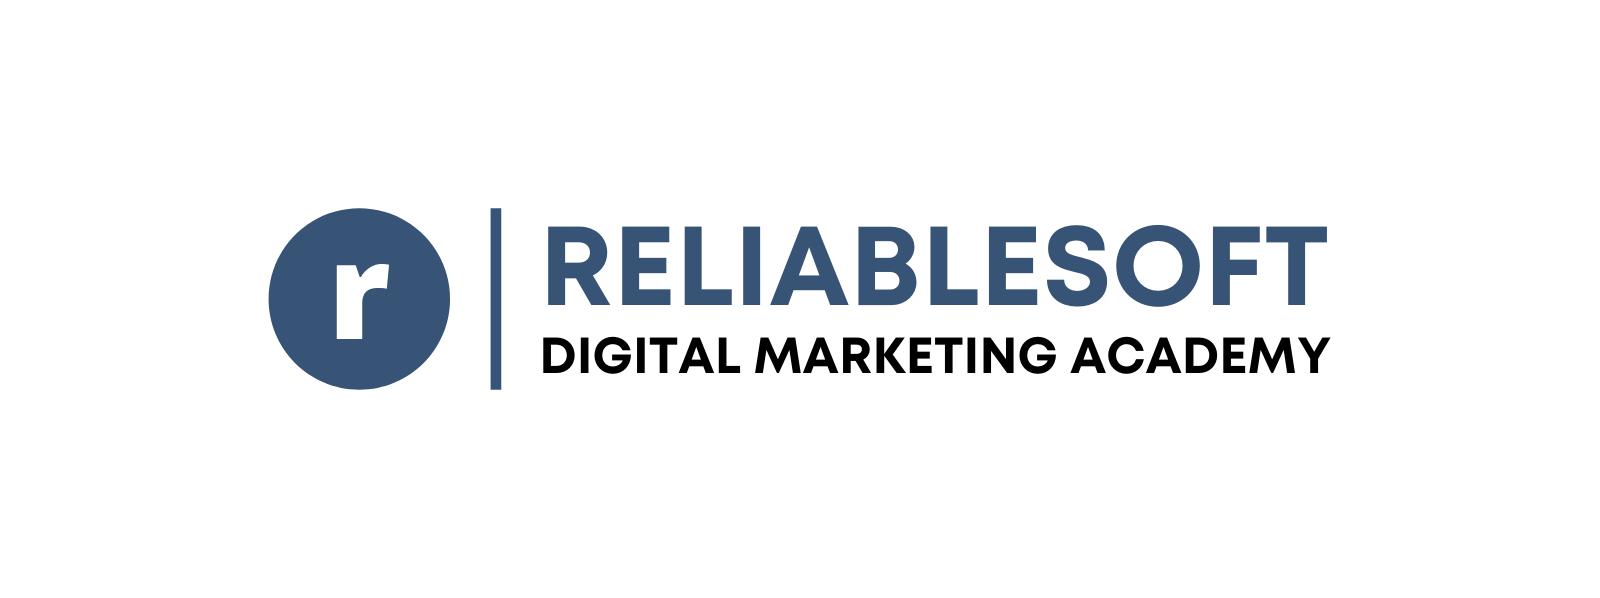 Reliablesoft Digital Marketing Academy